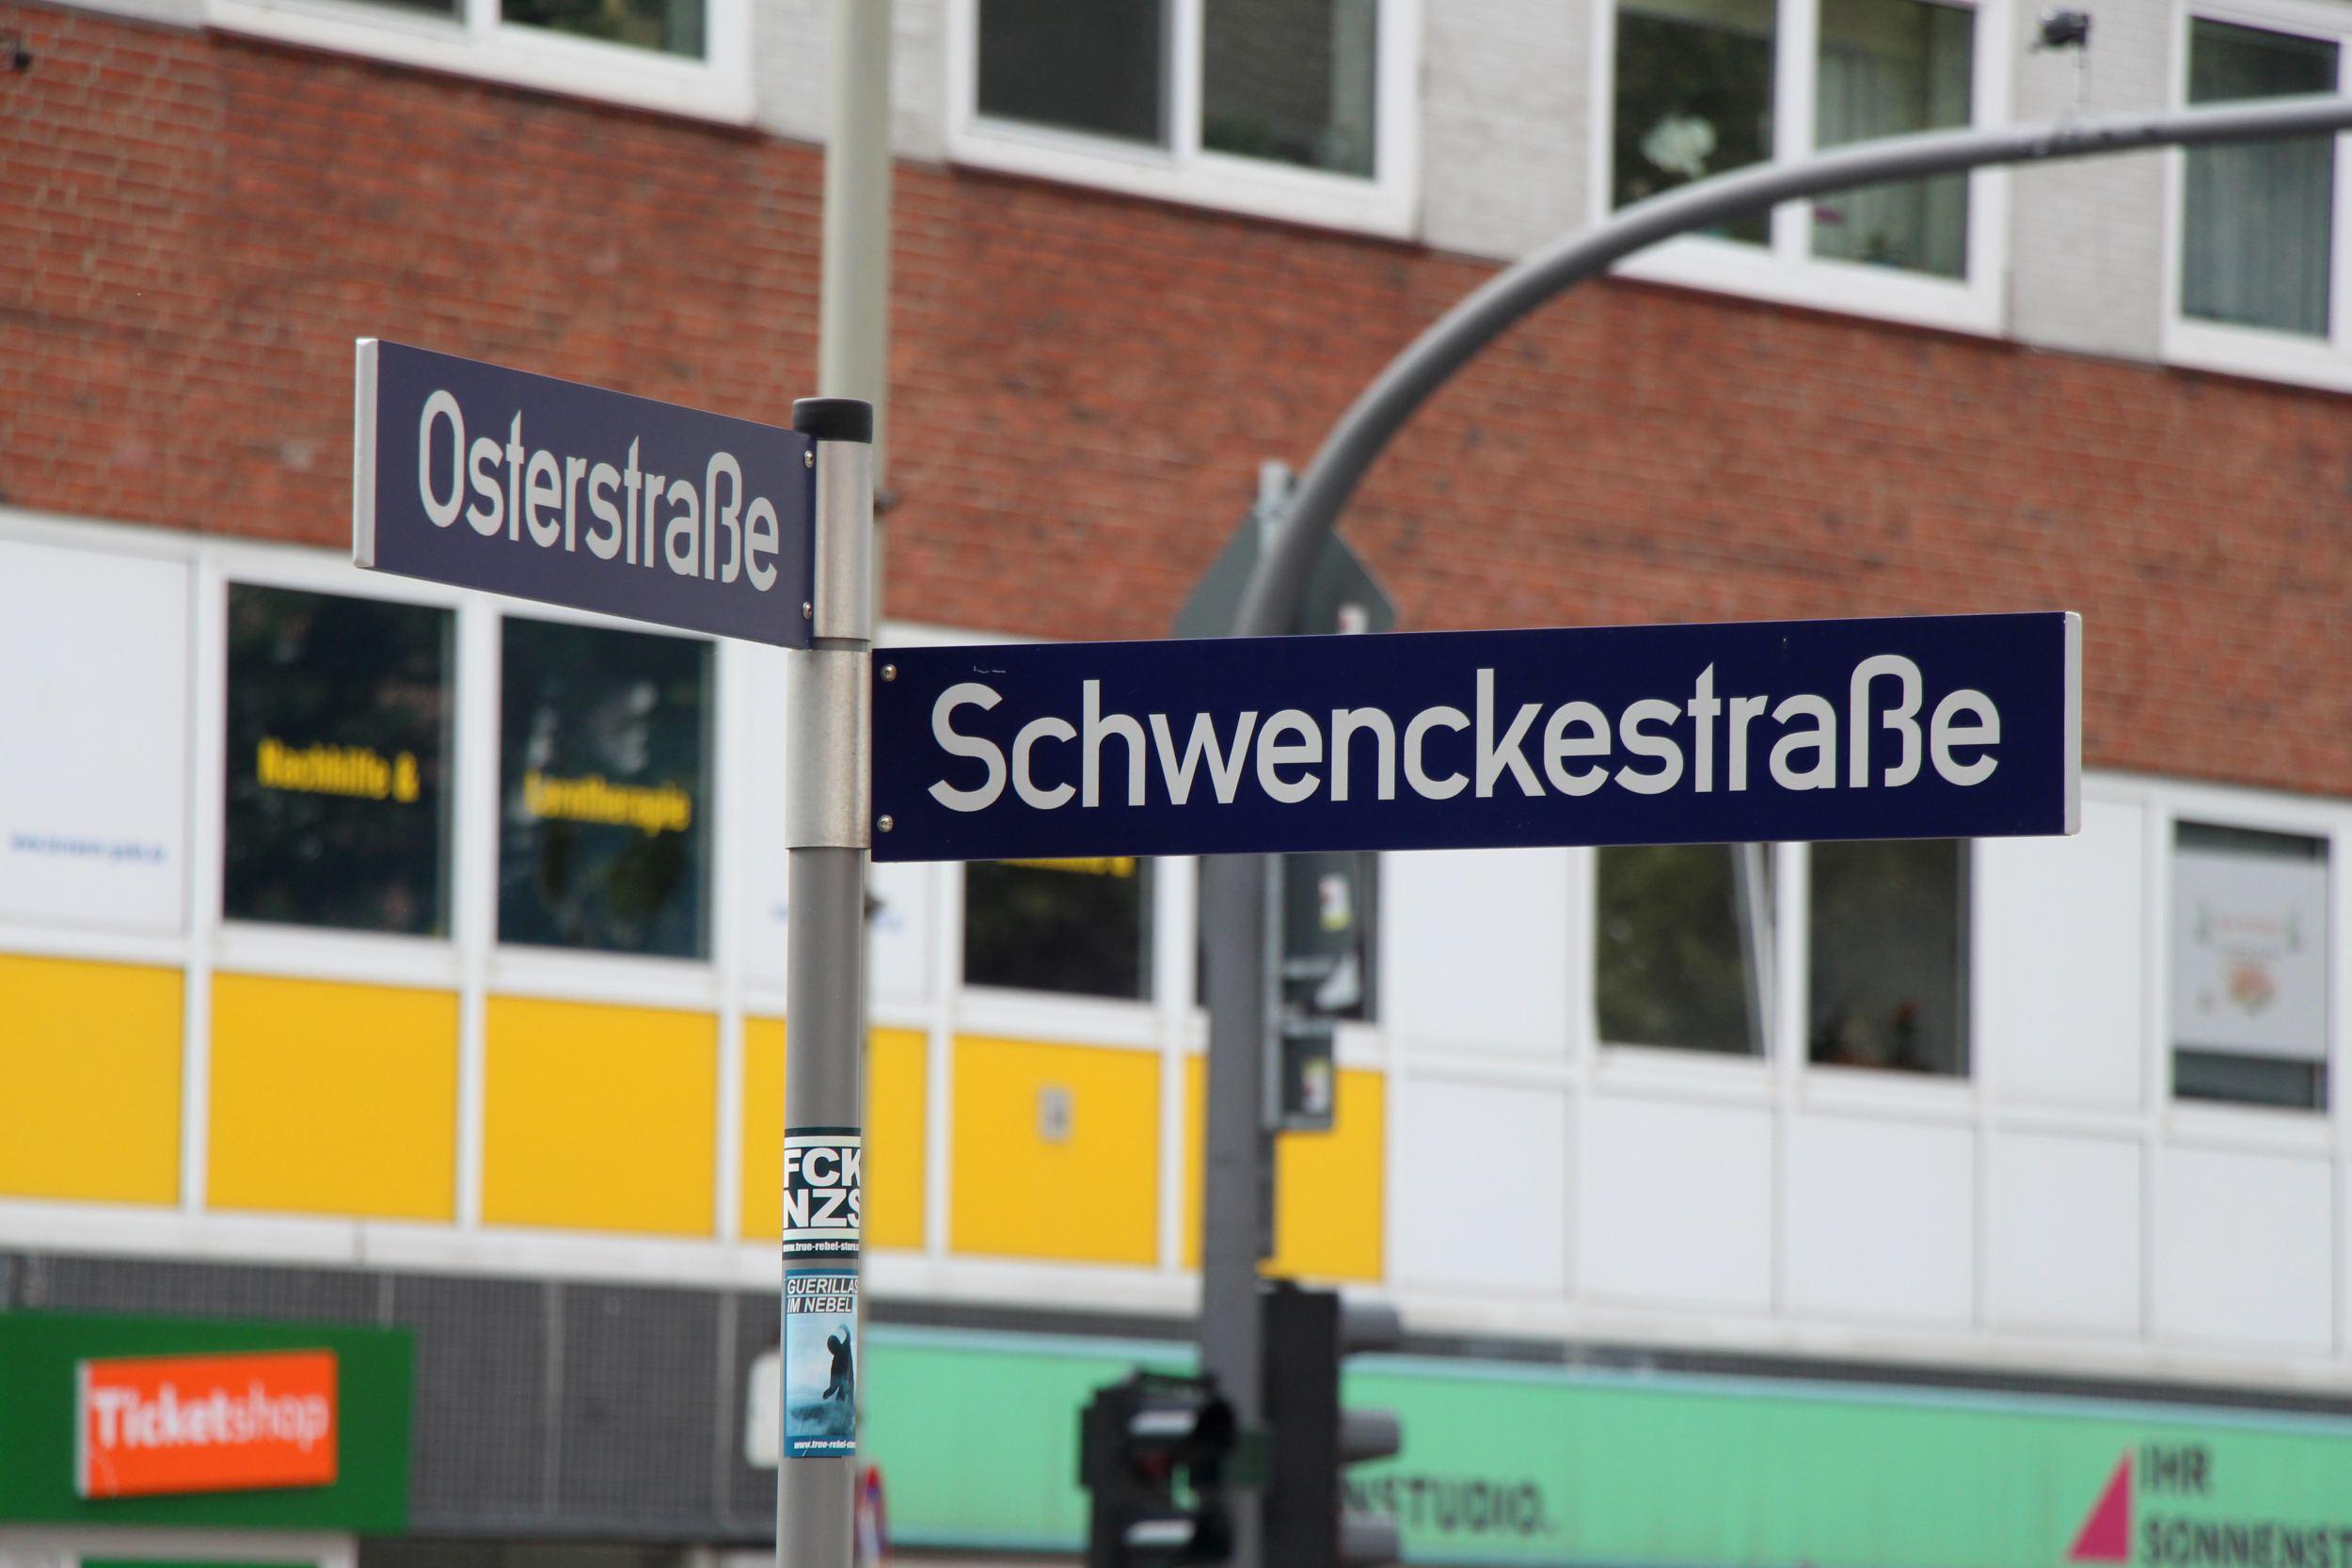 Osterstraße: Erneute Verkehrsbehinderungen